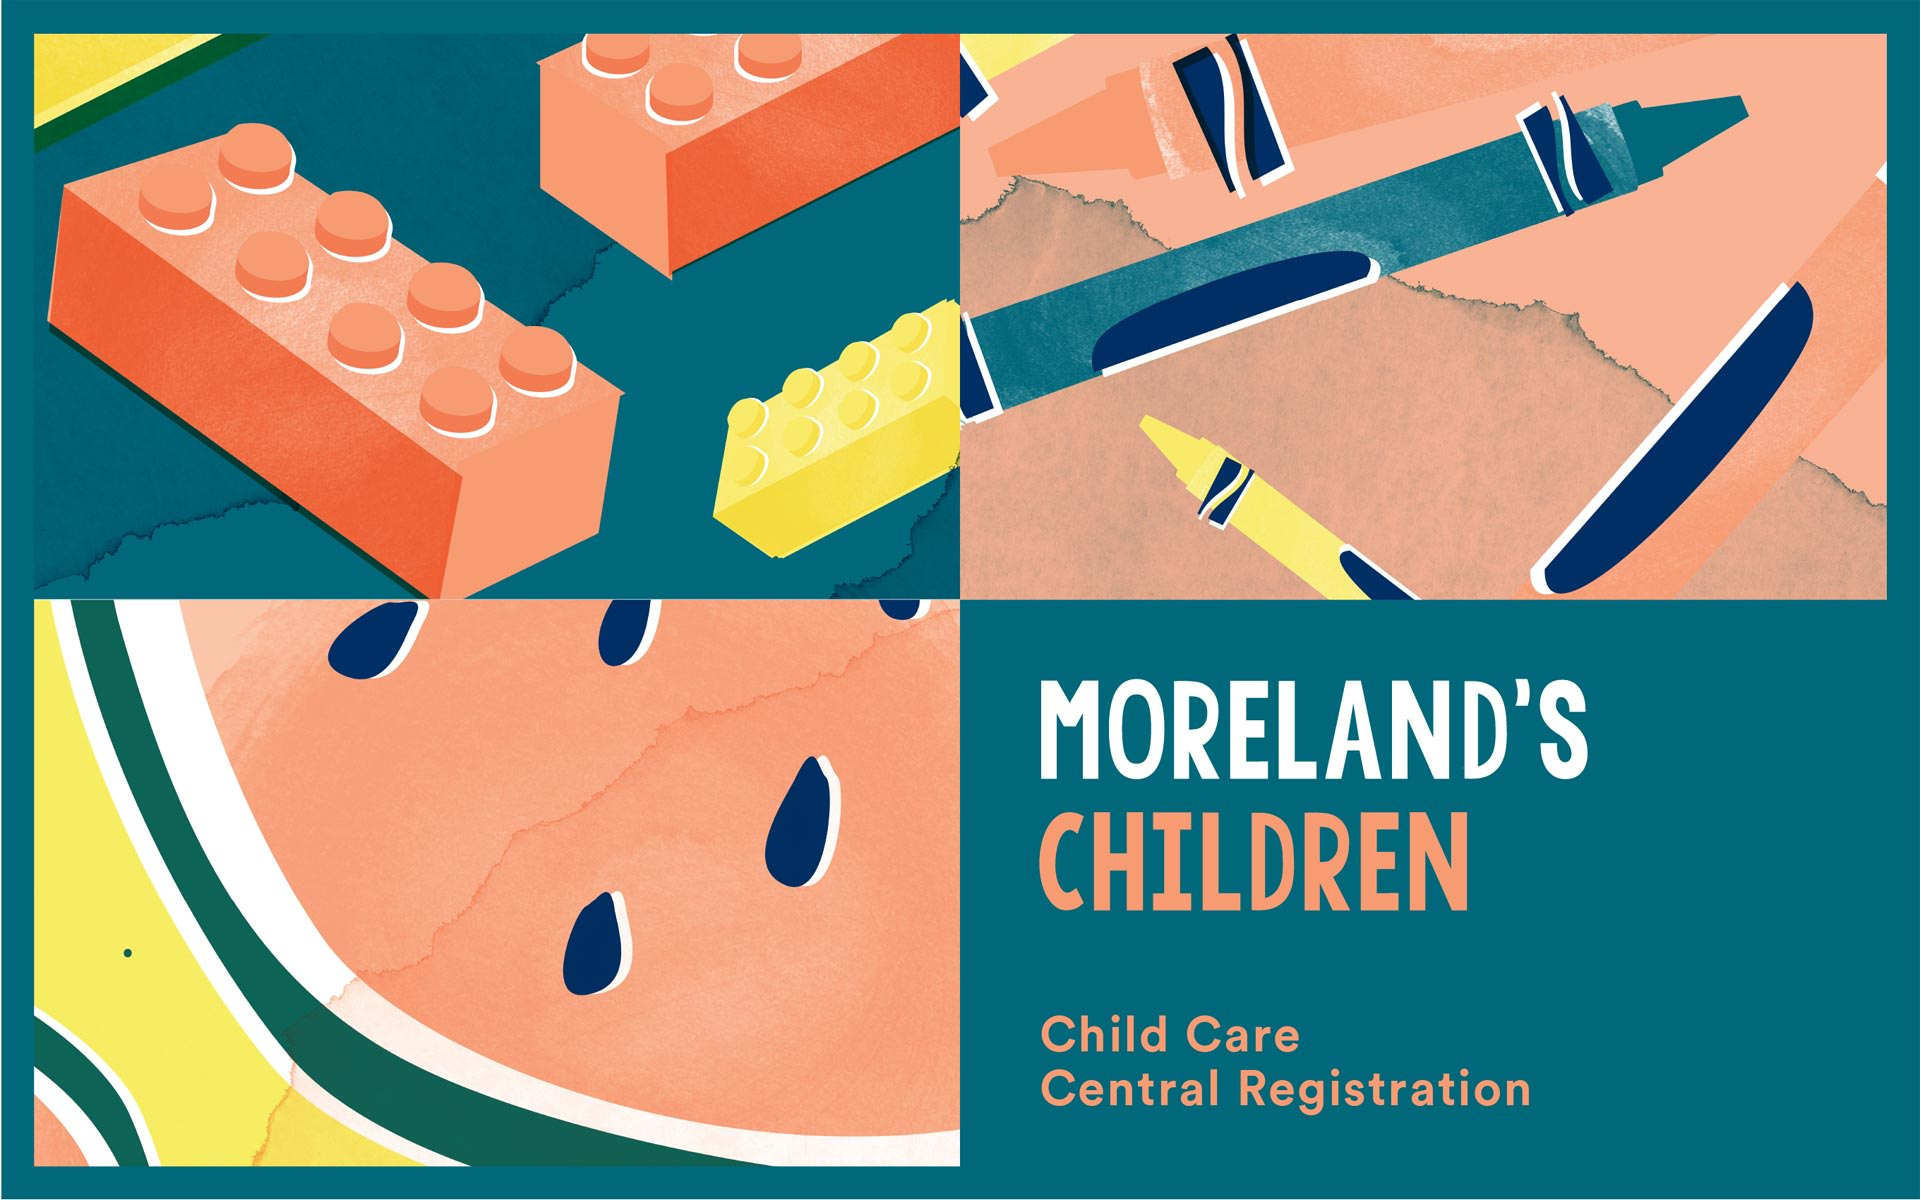 Moreland-City-Council-Children-Brand-Identity